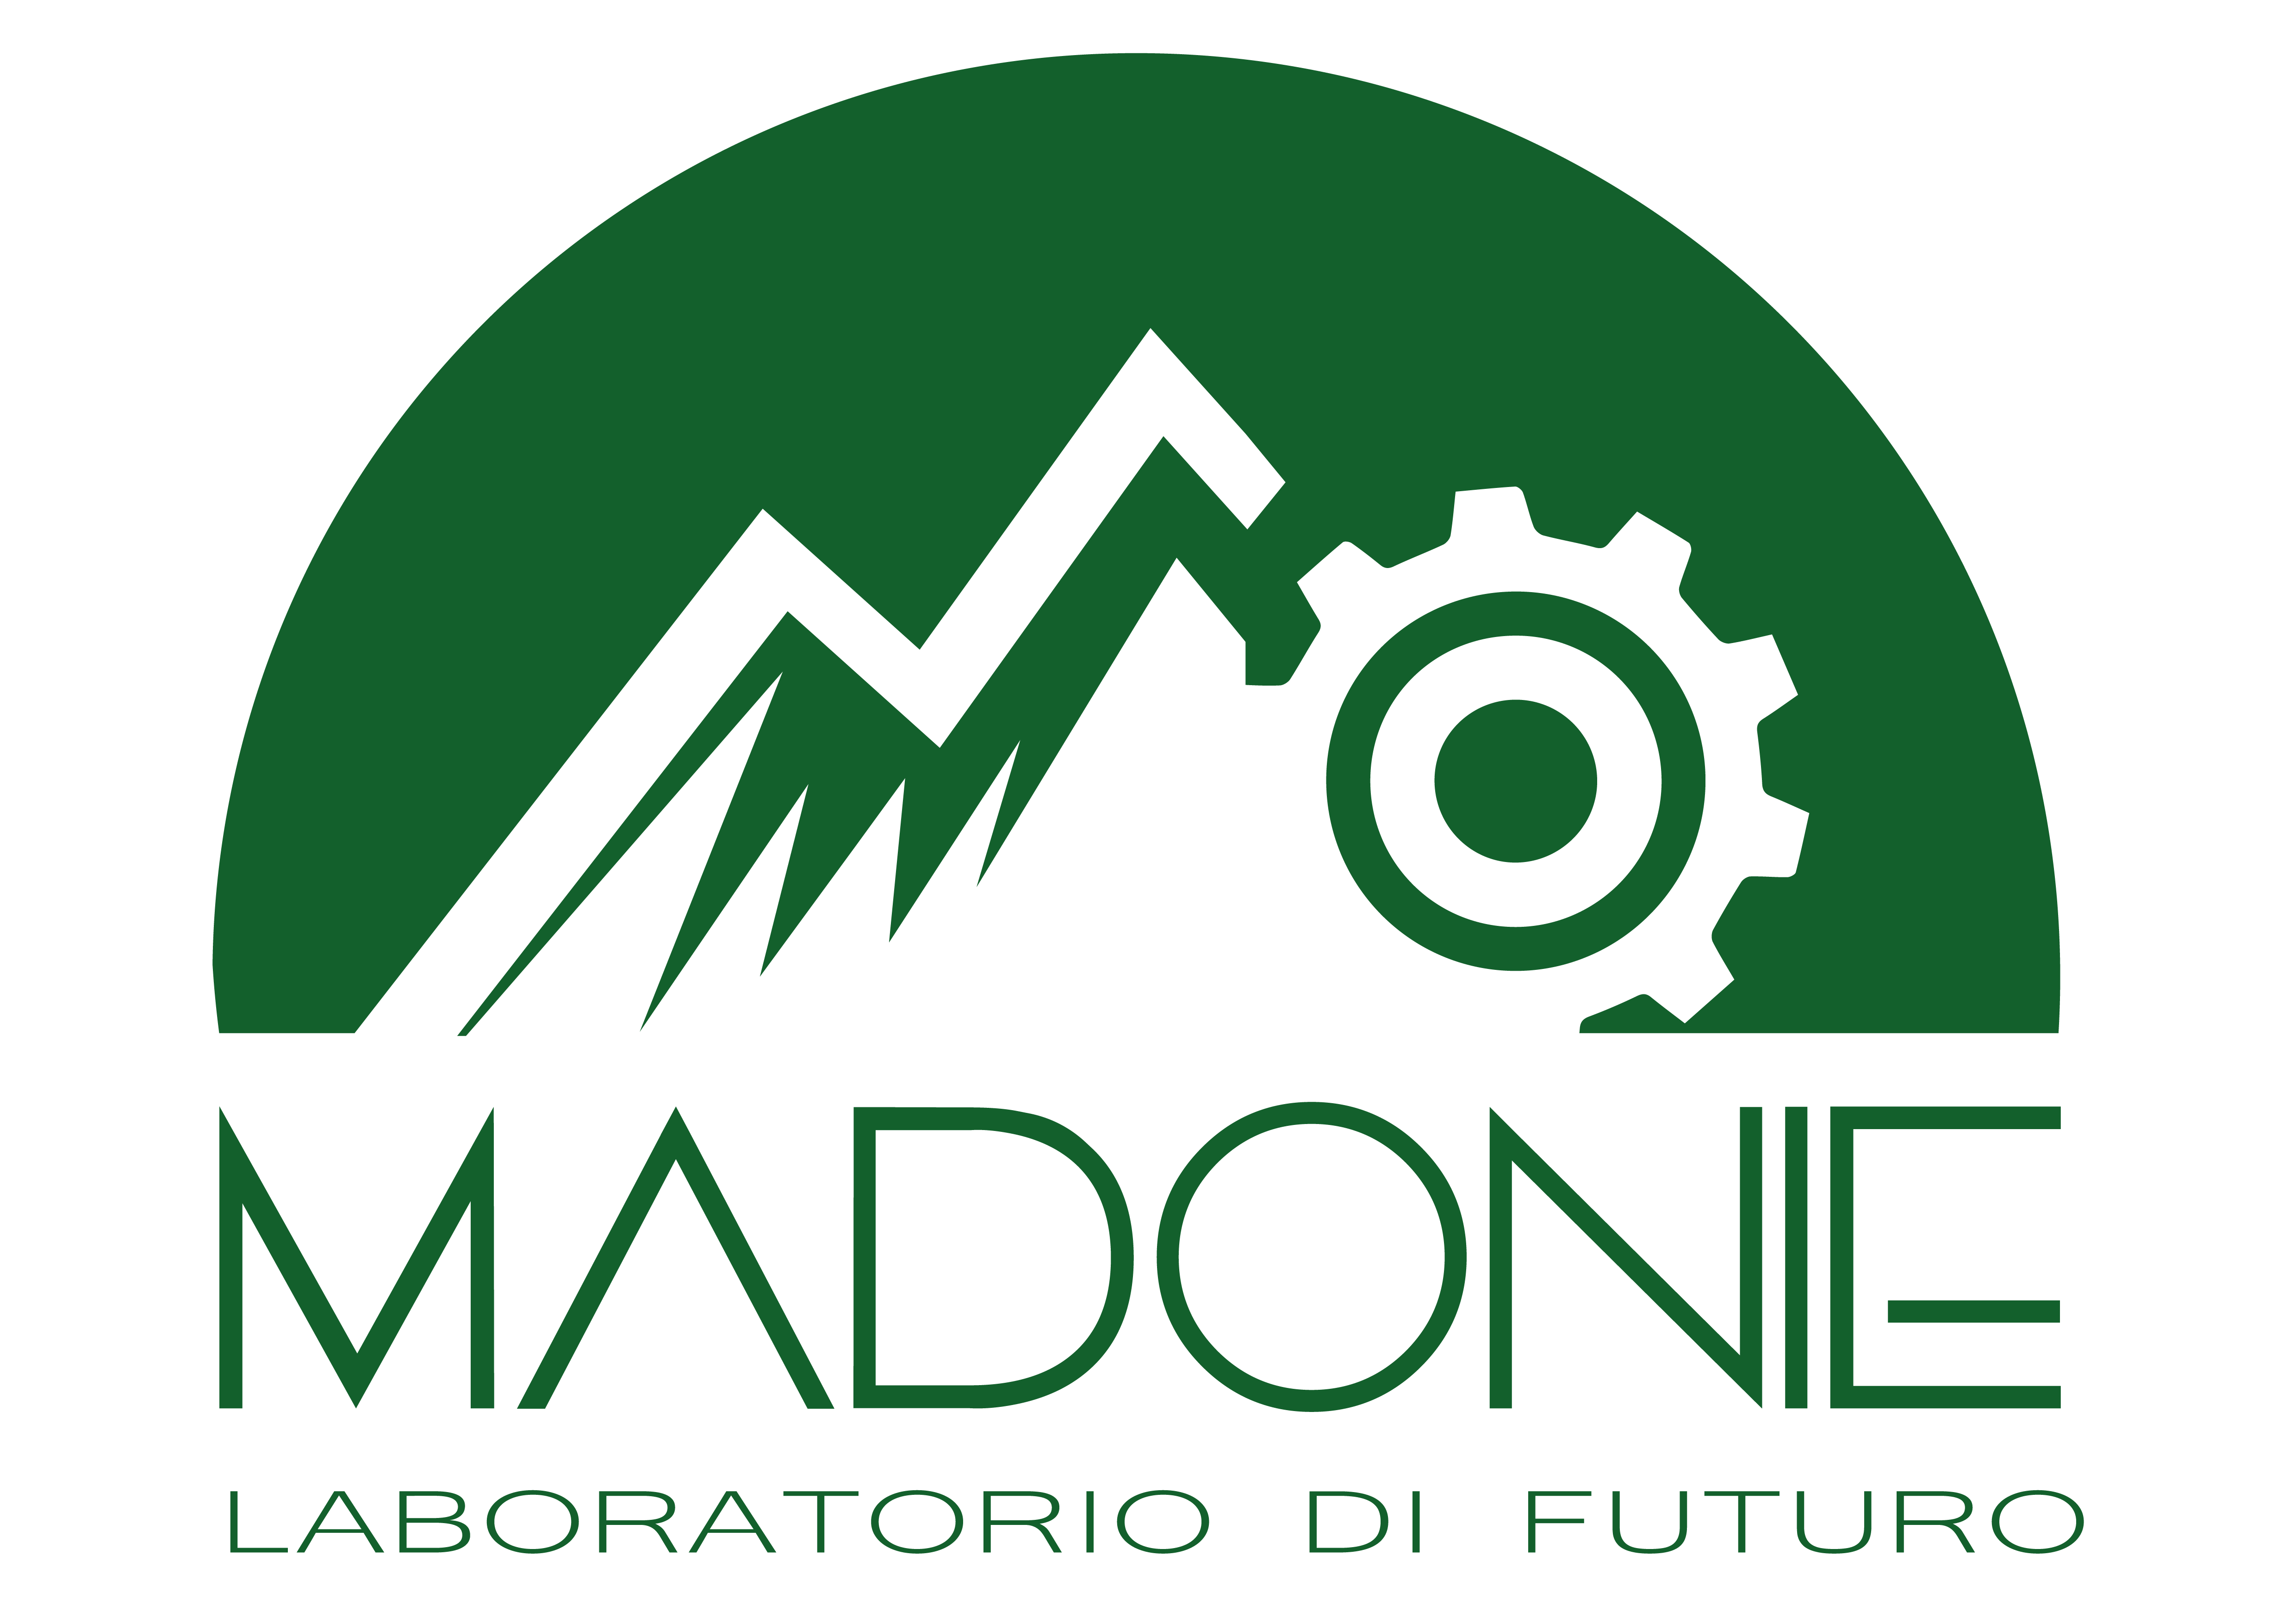 snai-madonie-logo